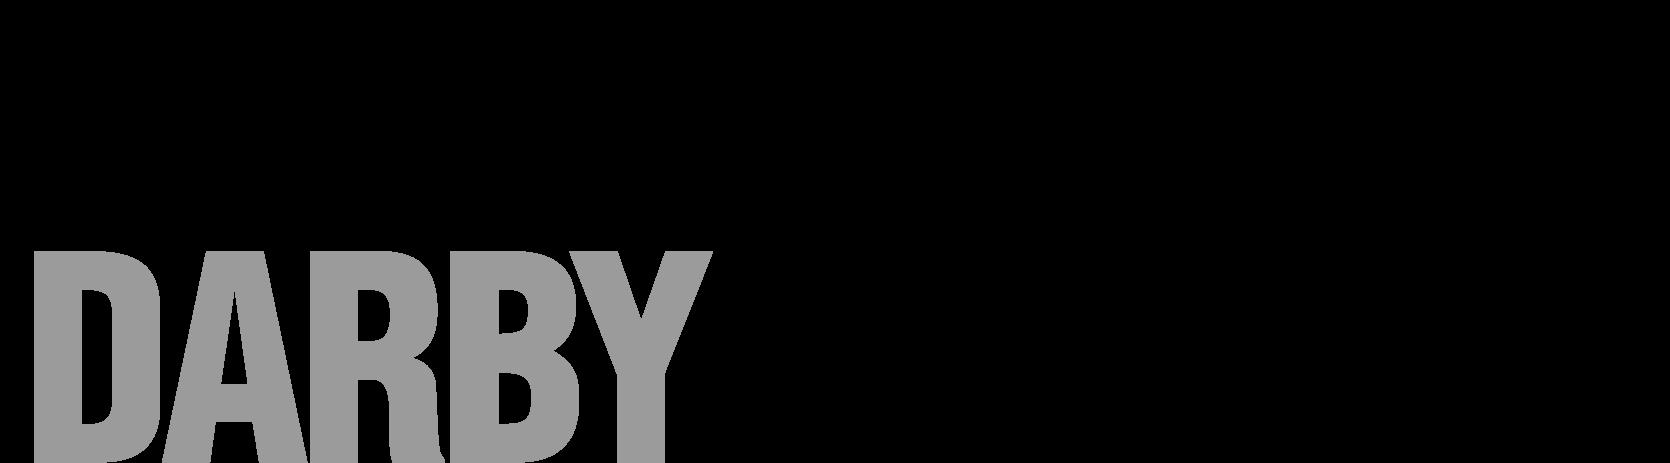 WinterbothamDarby_Logo_Stacked_Black_Mono_RGB